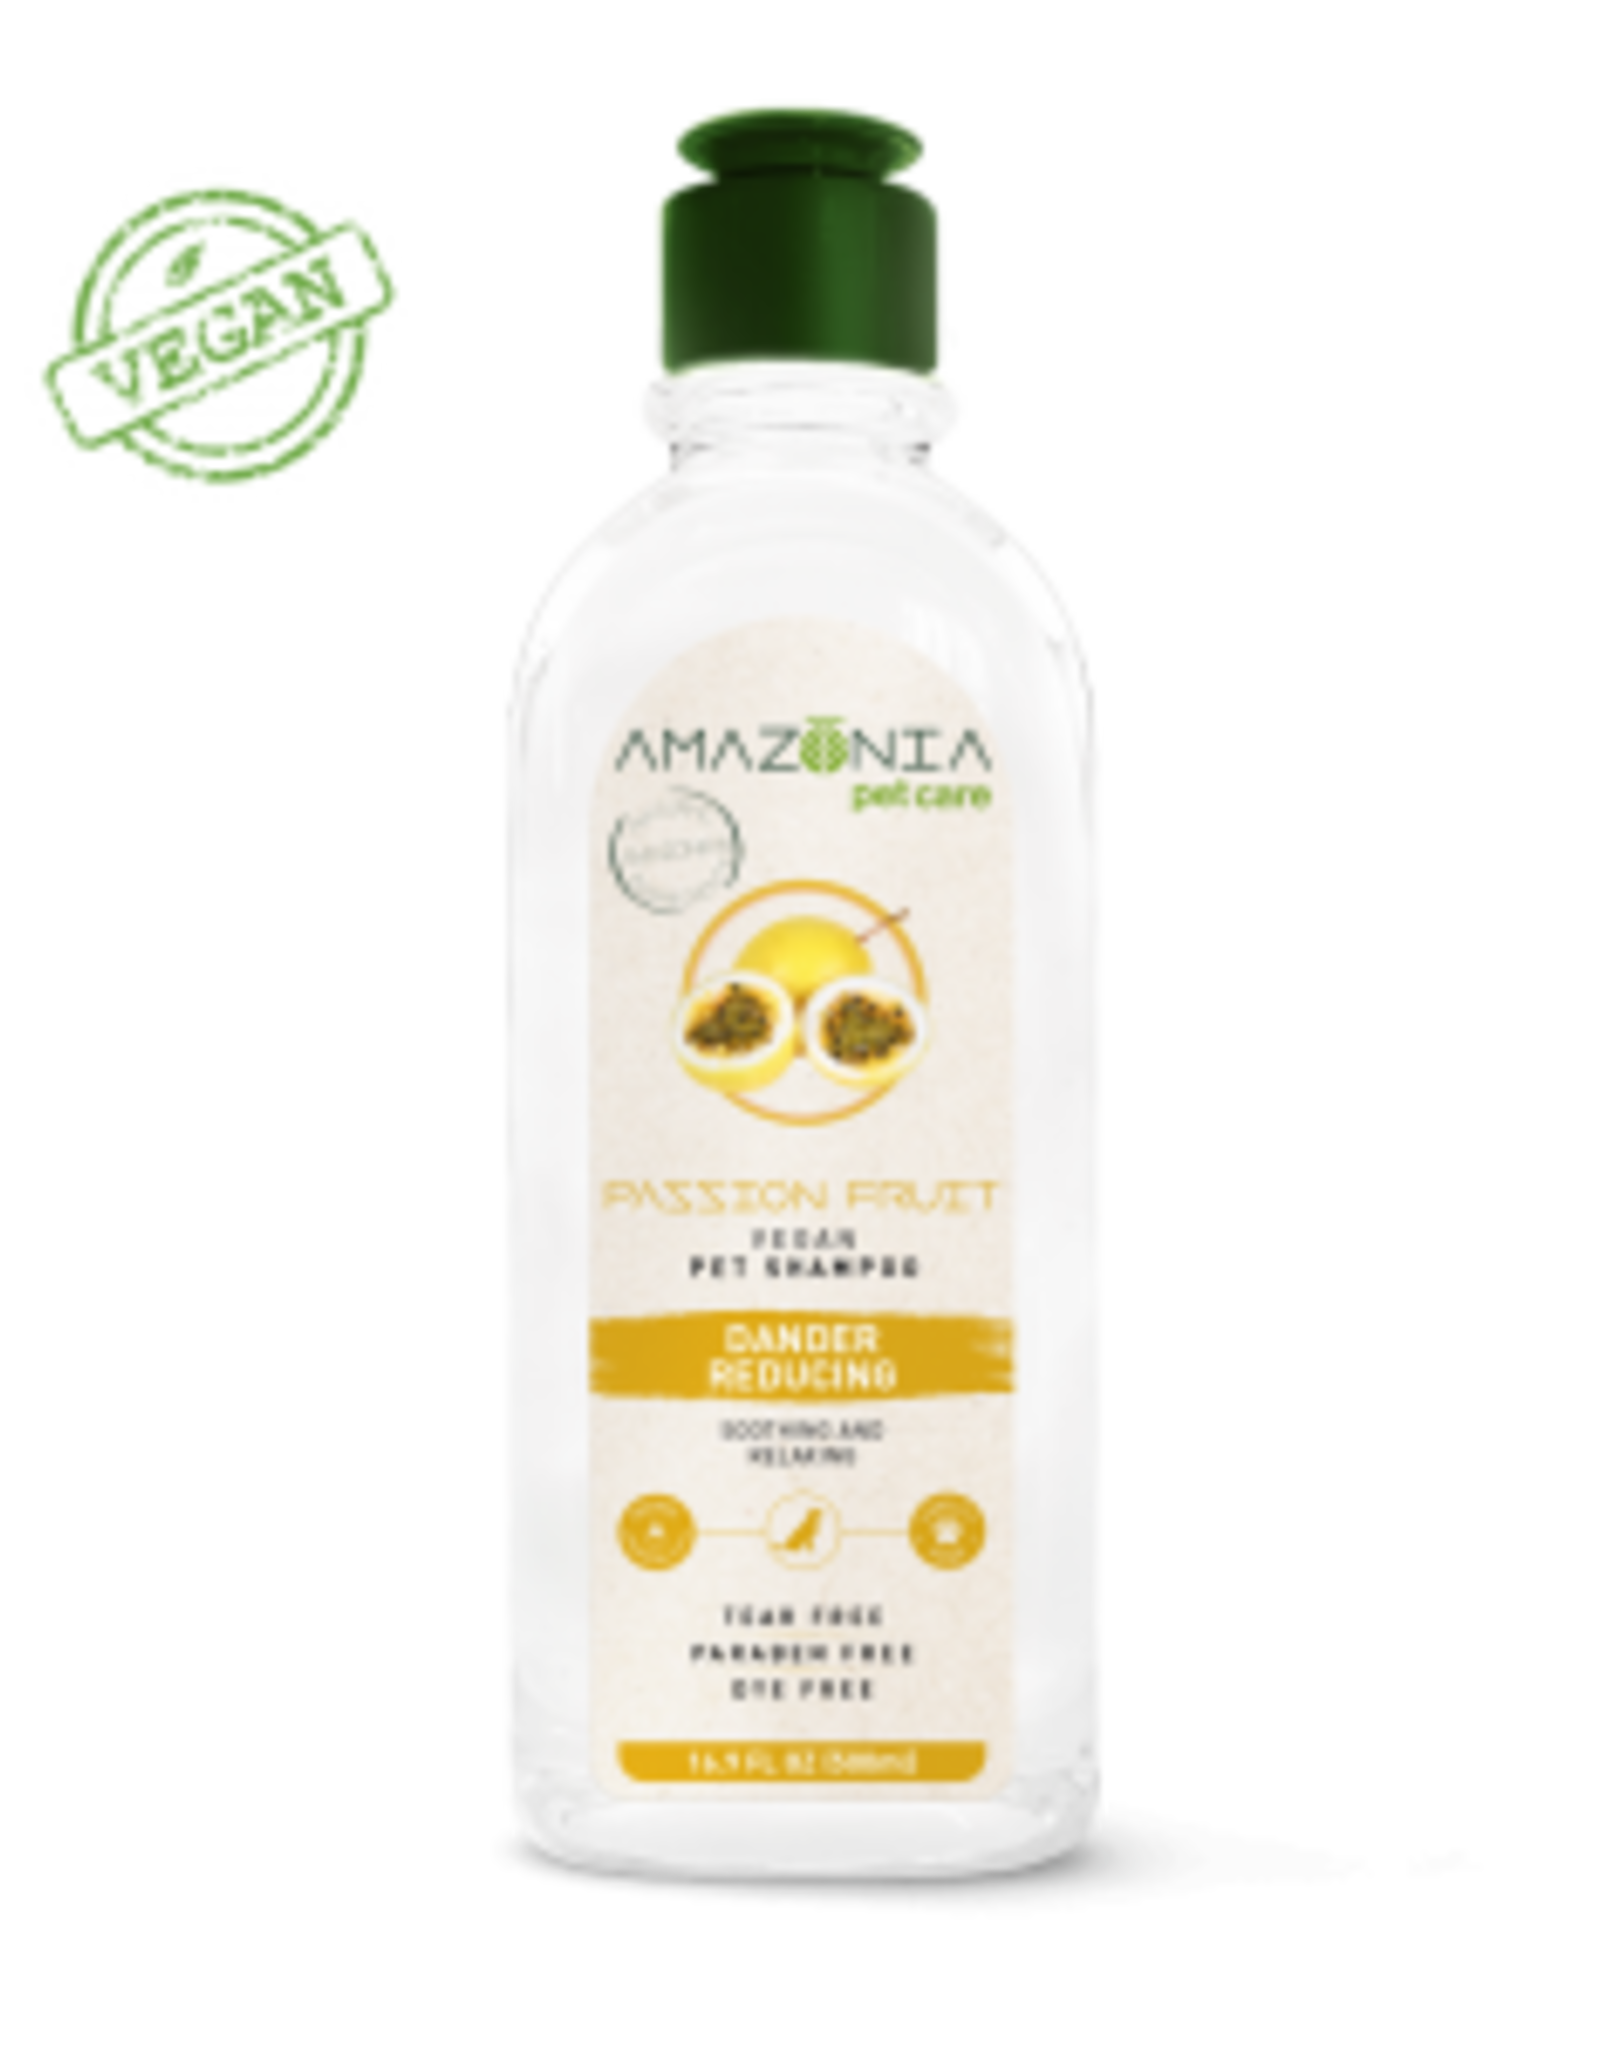 Amazonia Amazonia